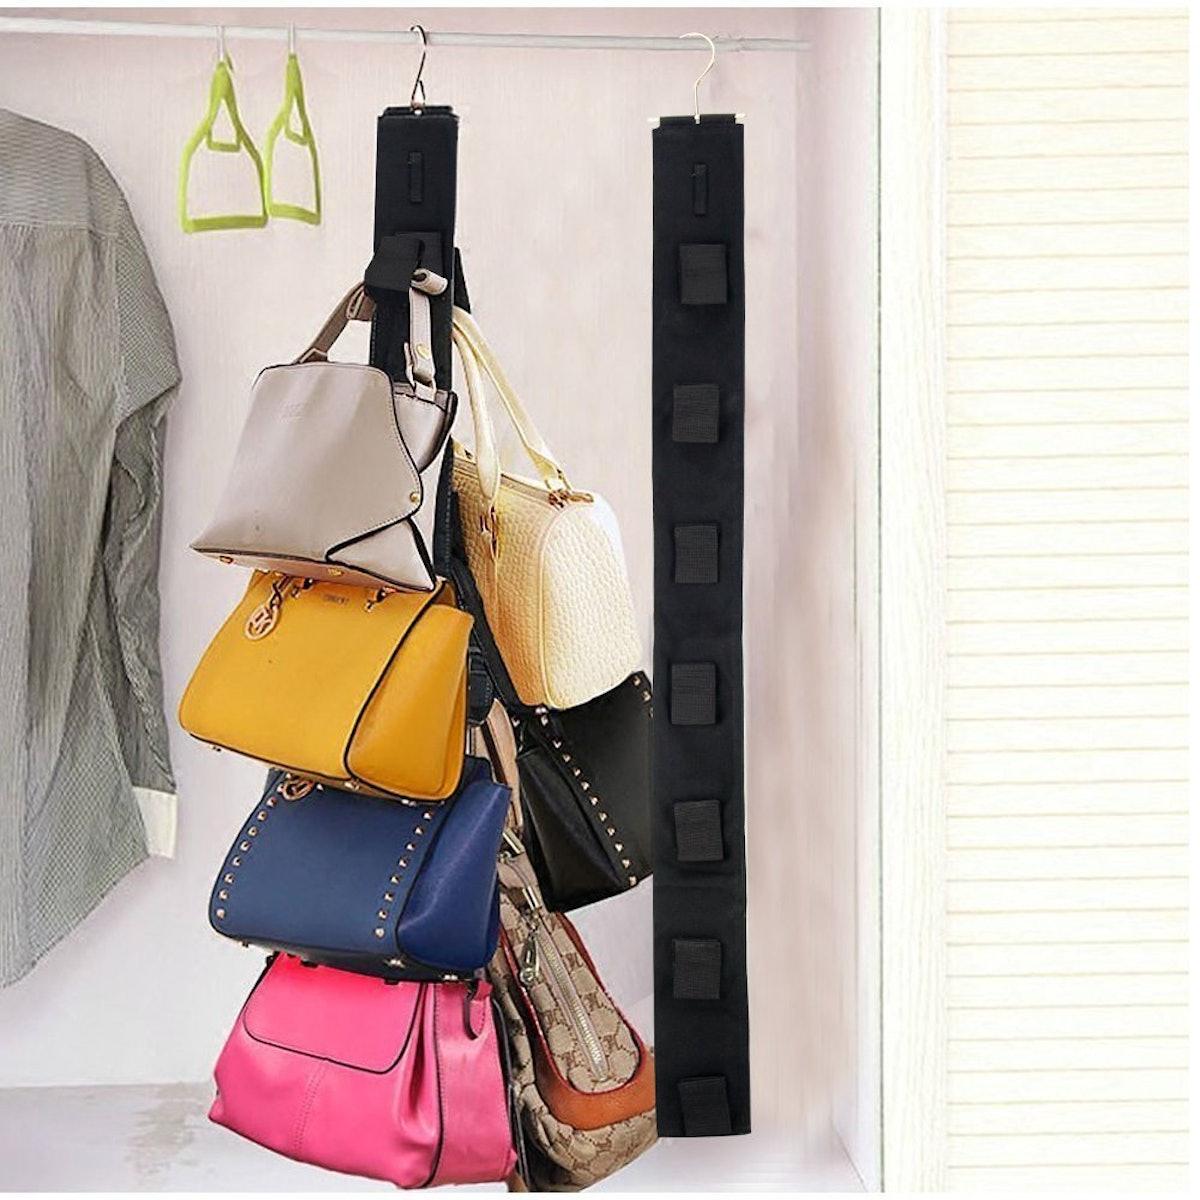 Relavel Handbag Organizer